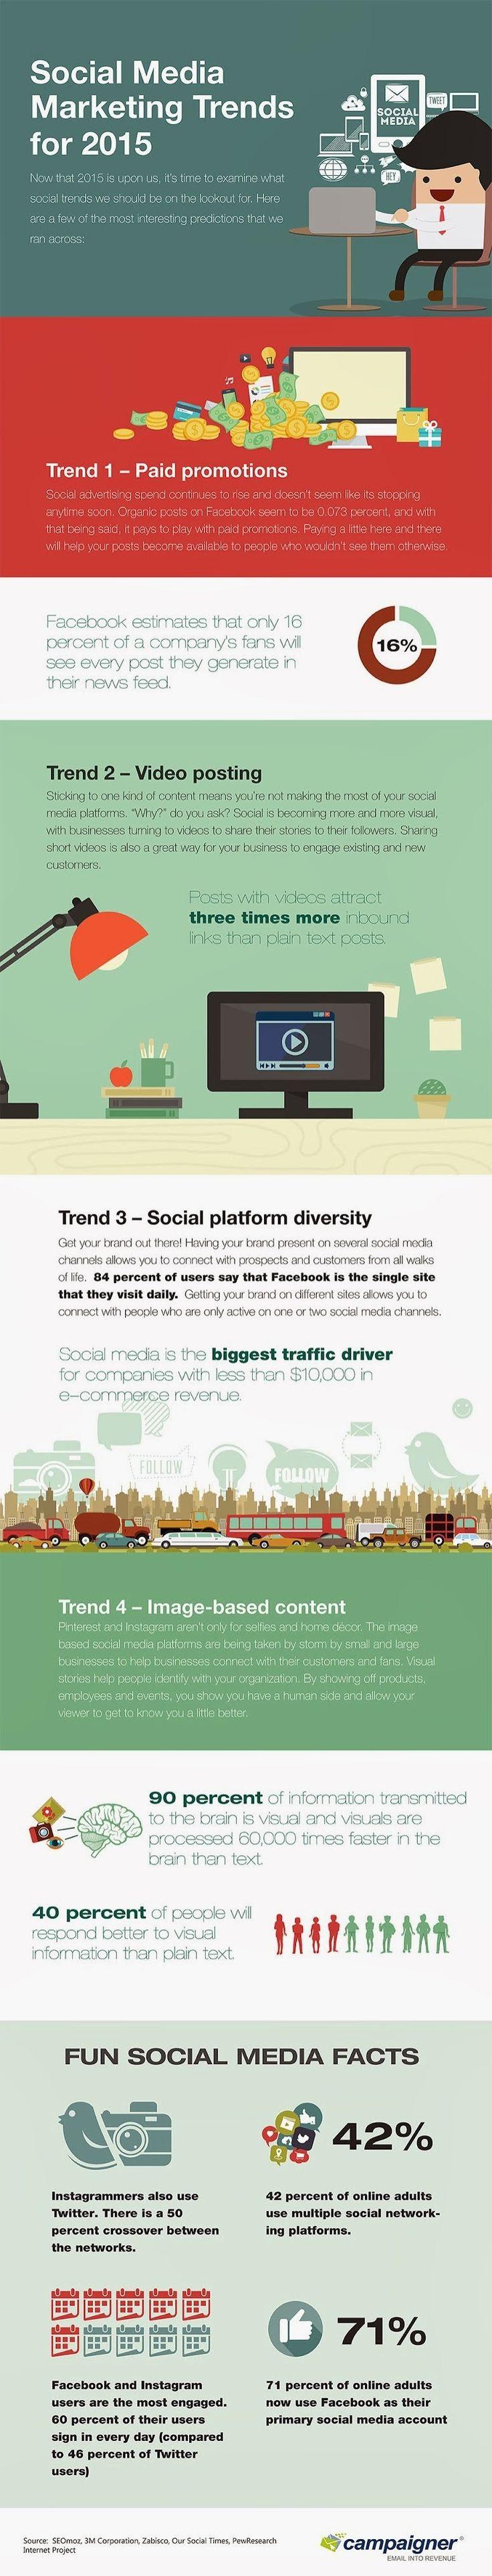 Tendencias en Social Media Marketing para 2015